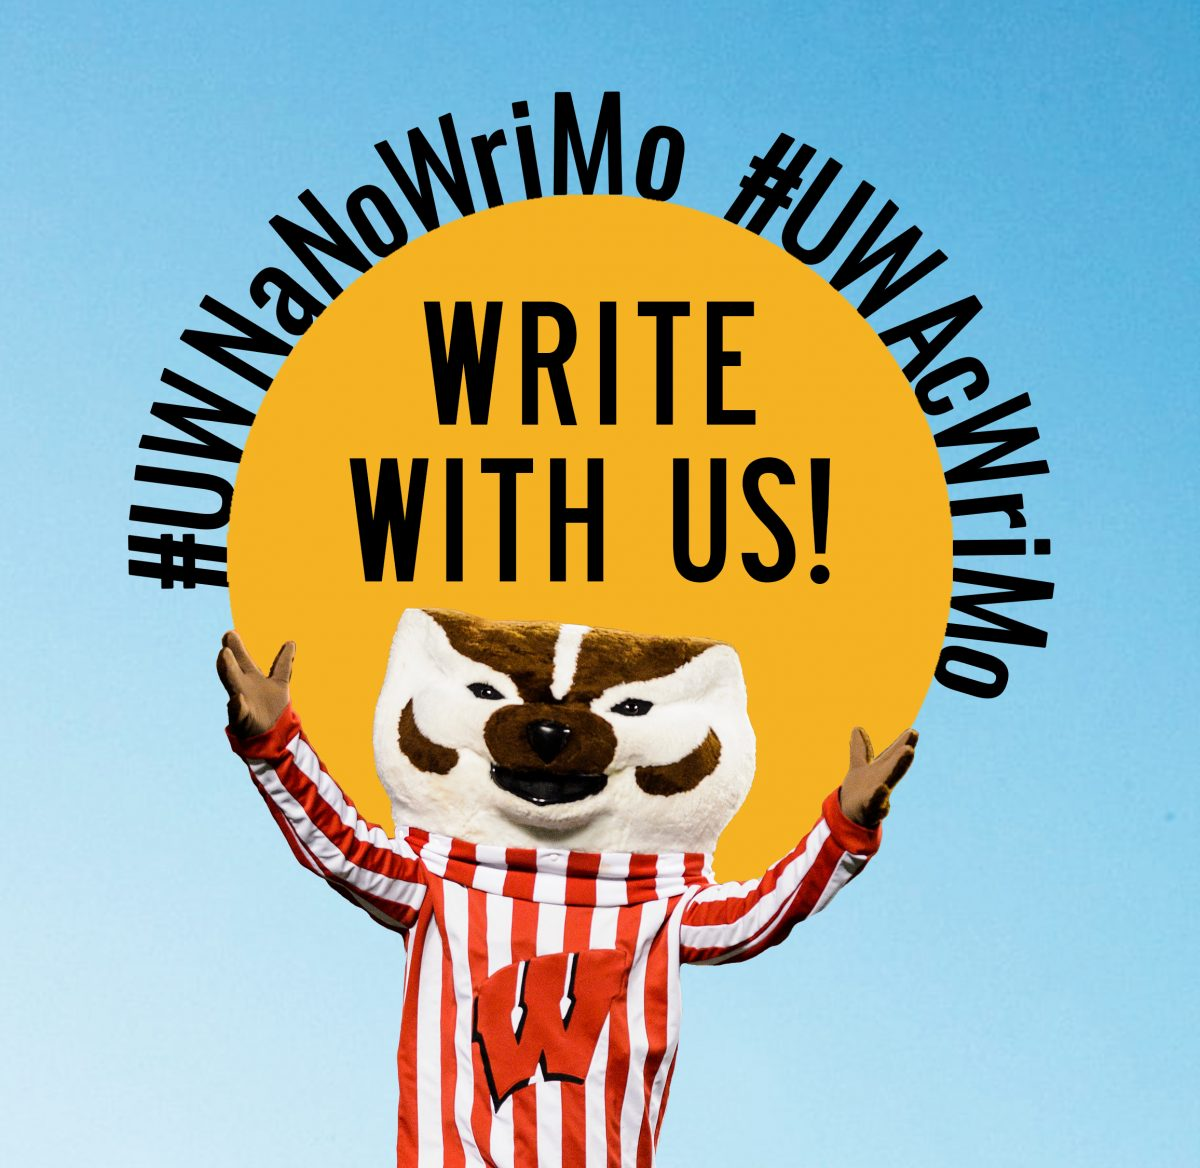 Write with Us! #NaNoWriMo #AcWriMo